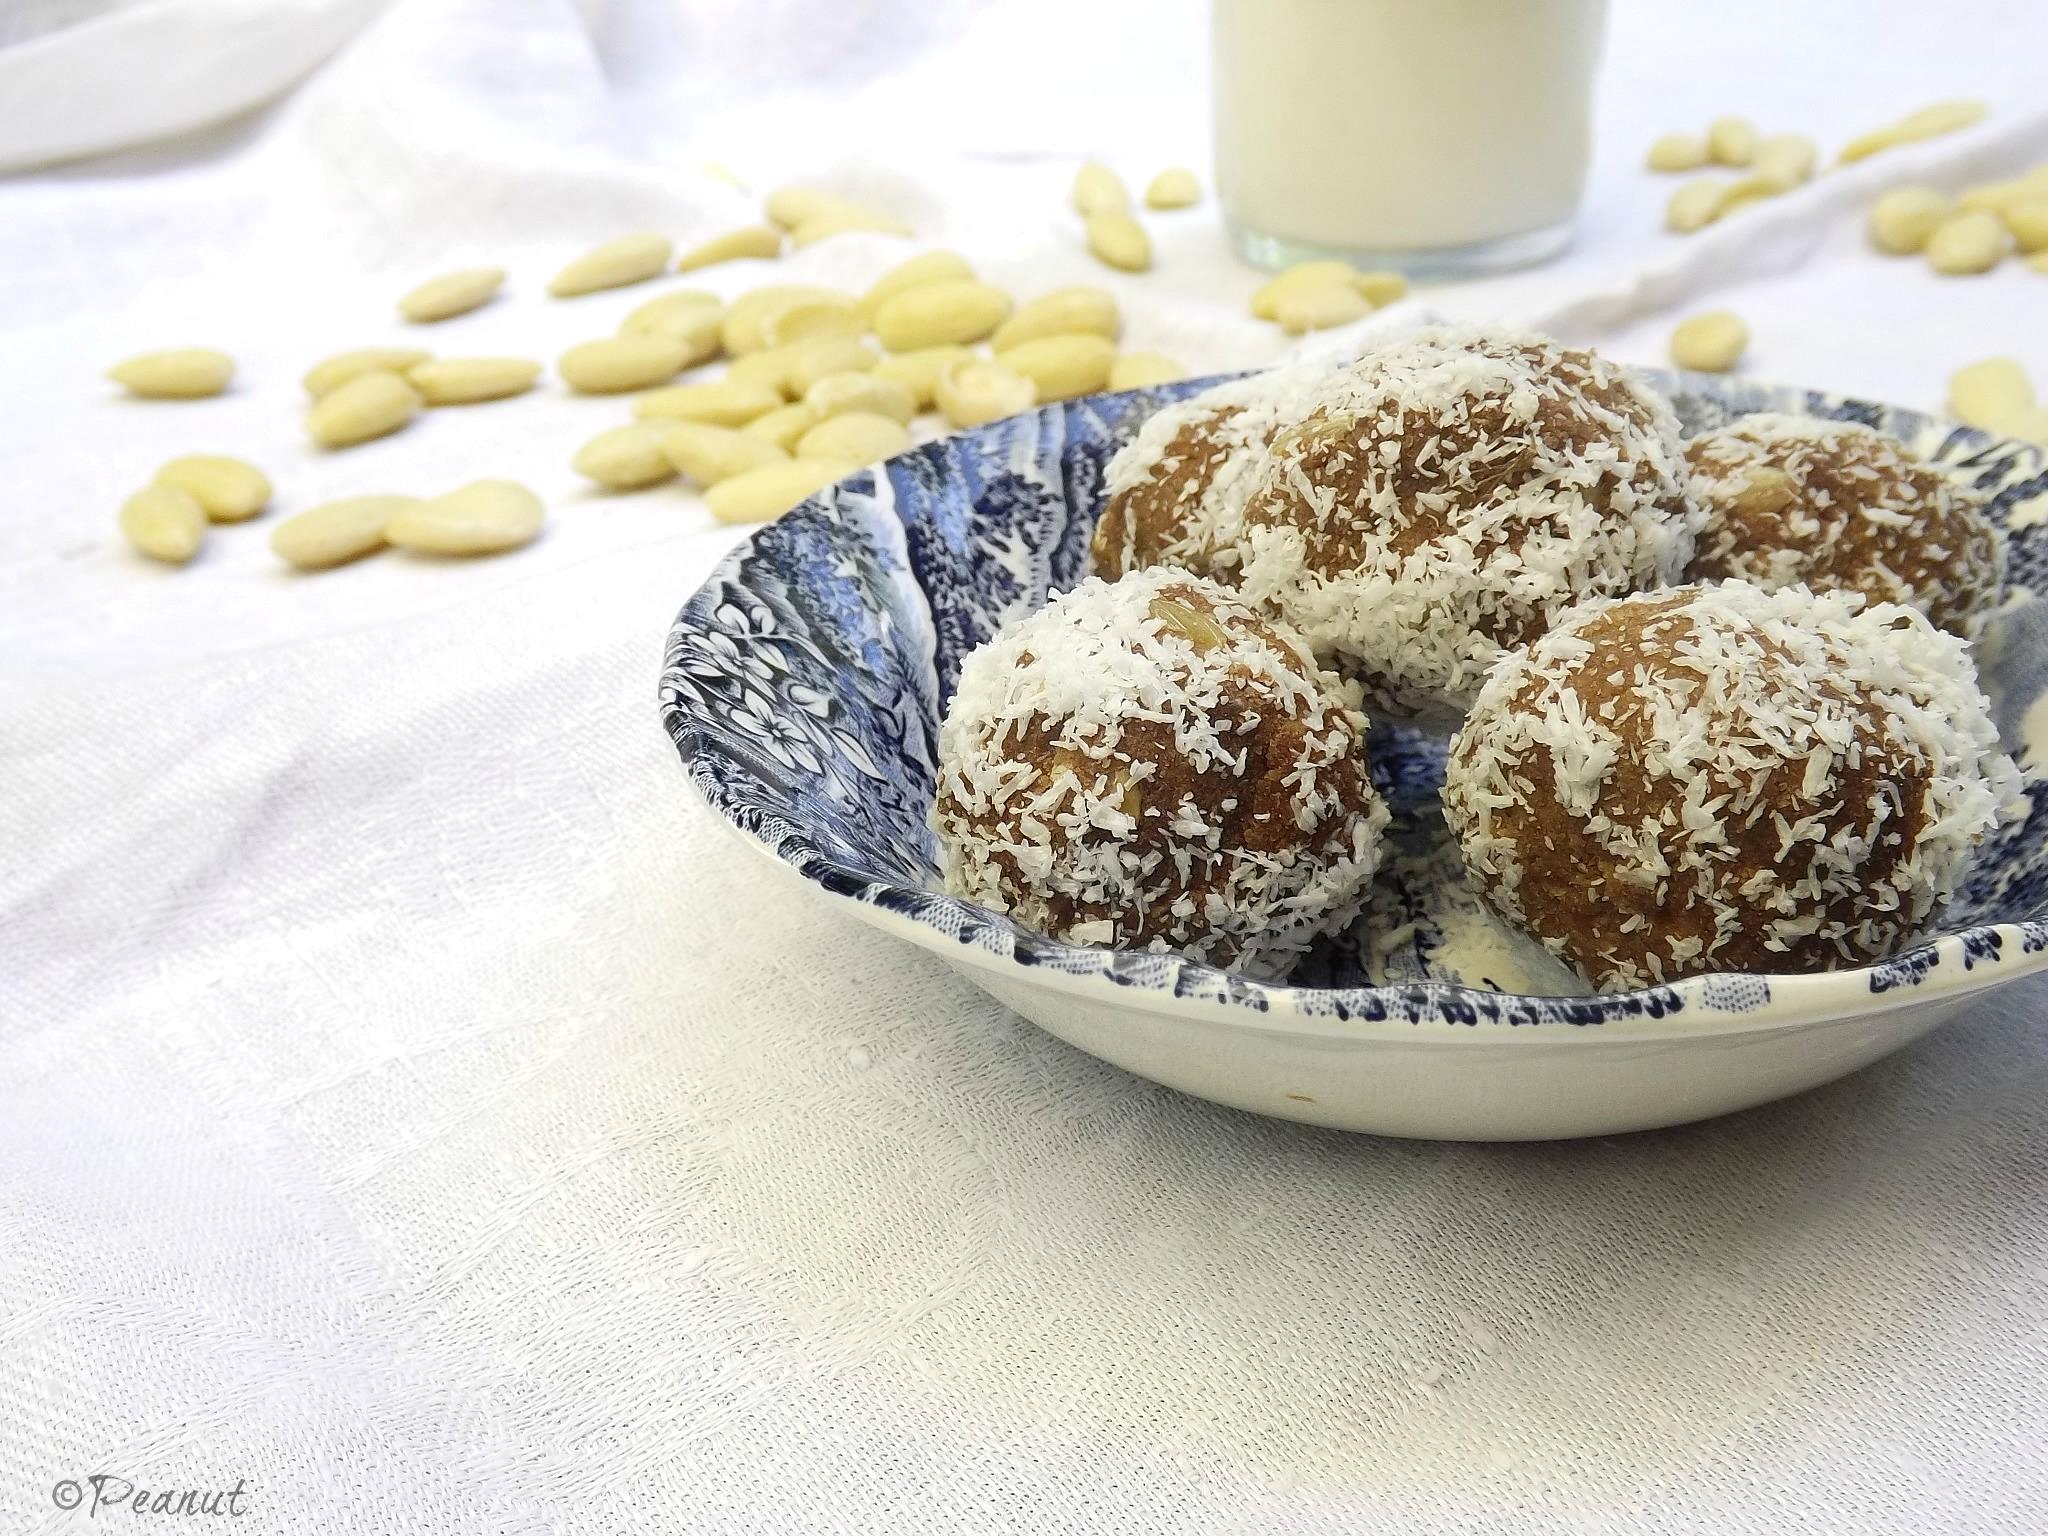 Homemade almond milk and raw almon pulp truffles